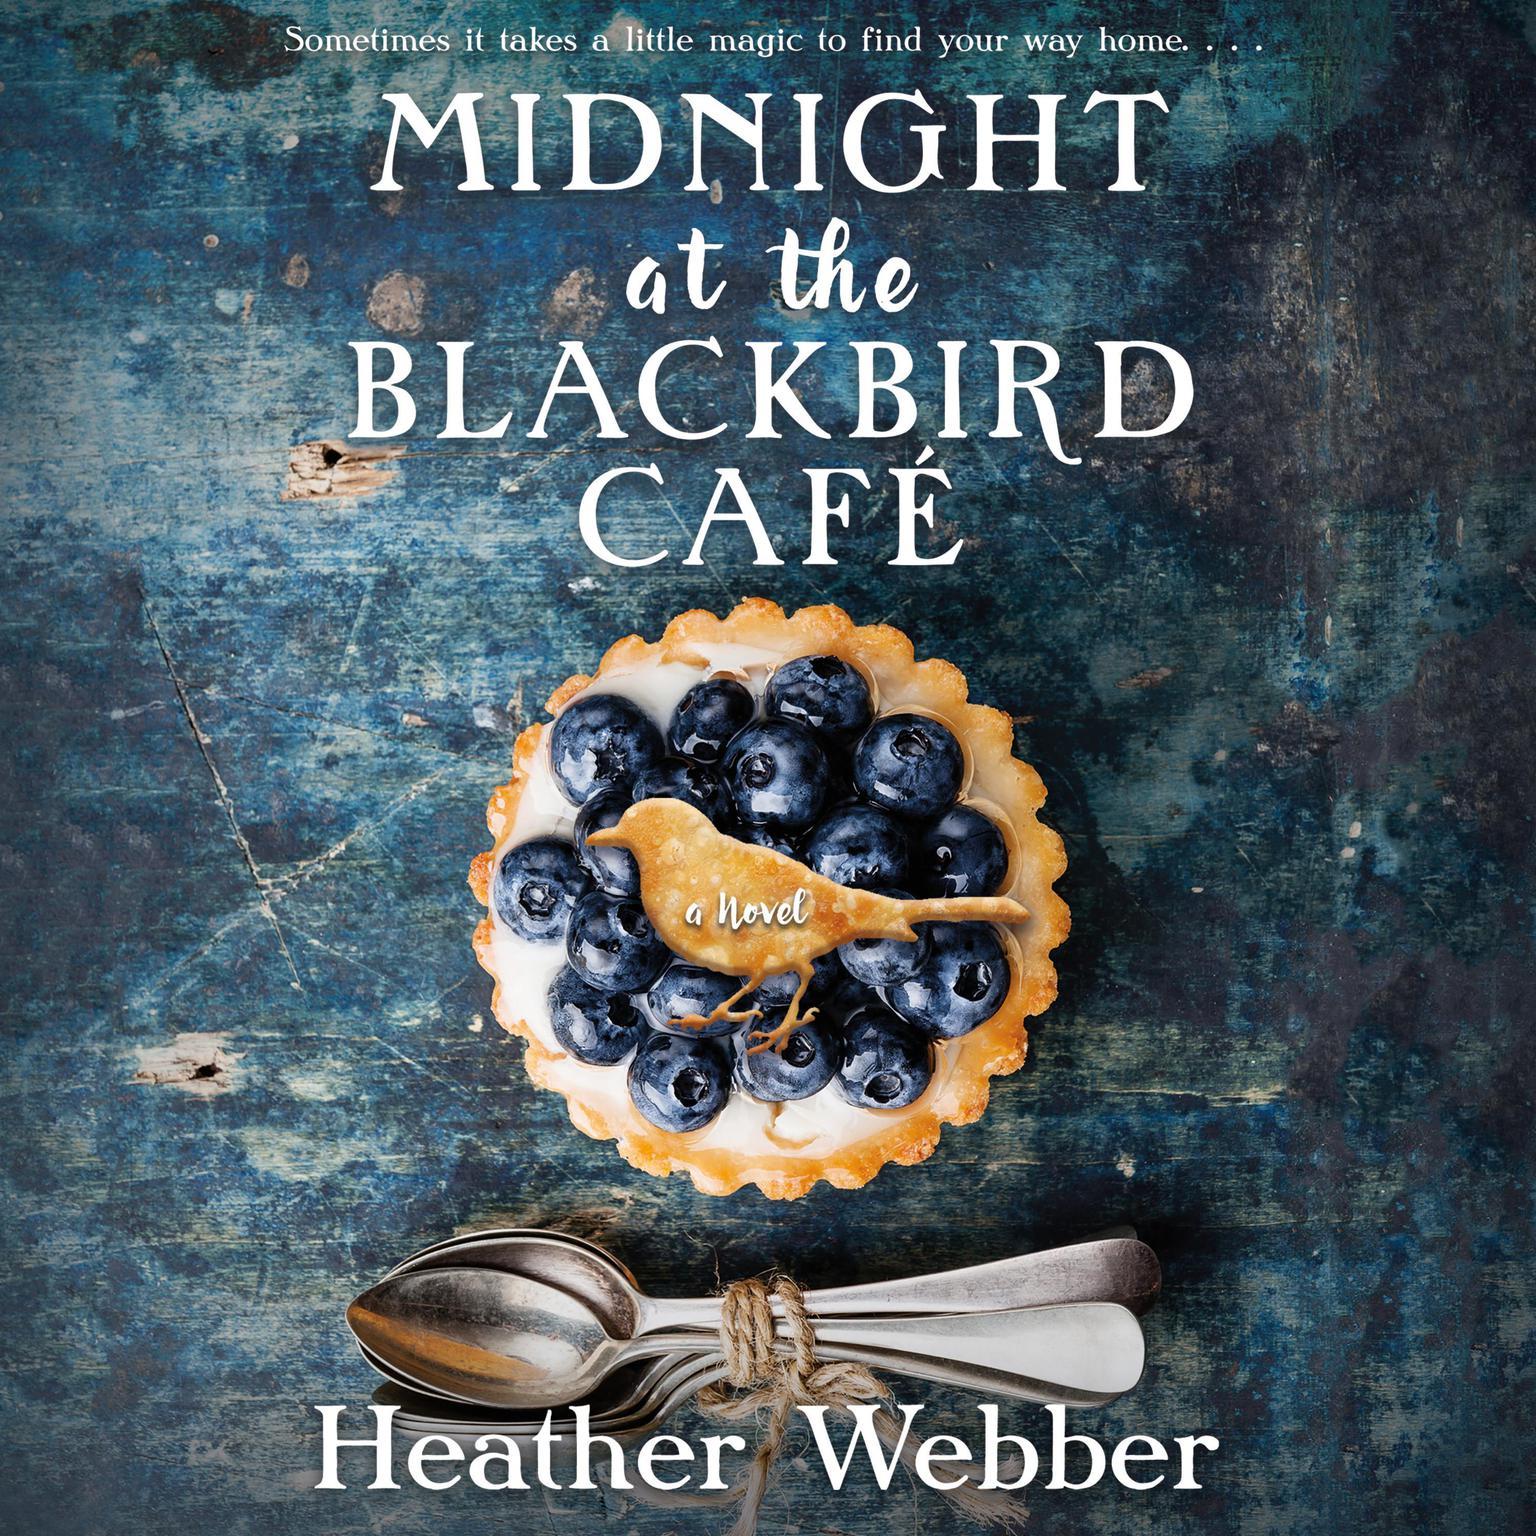 Midnight at the Blackbird Cafe: A Novel Audiobook, by Heather Webber